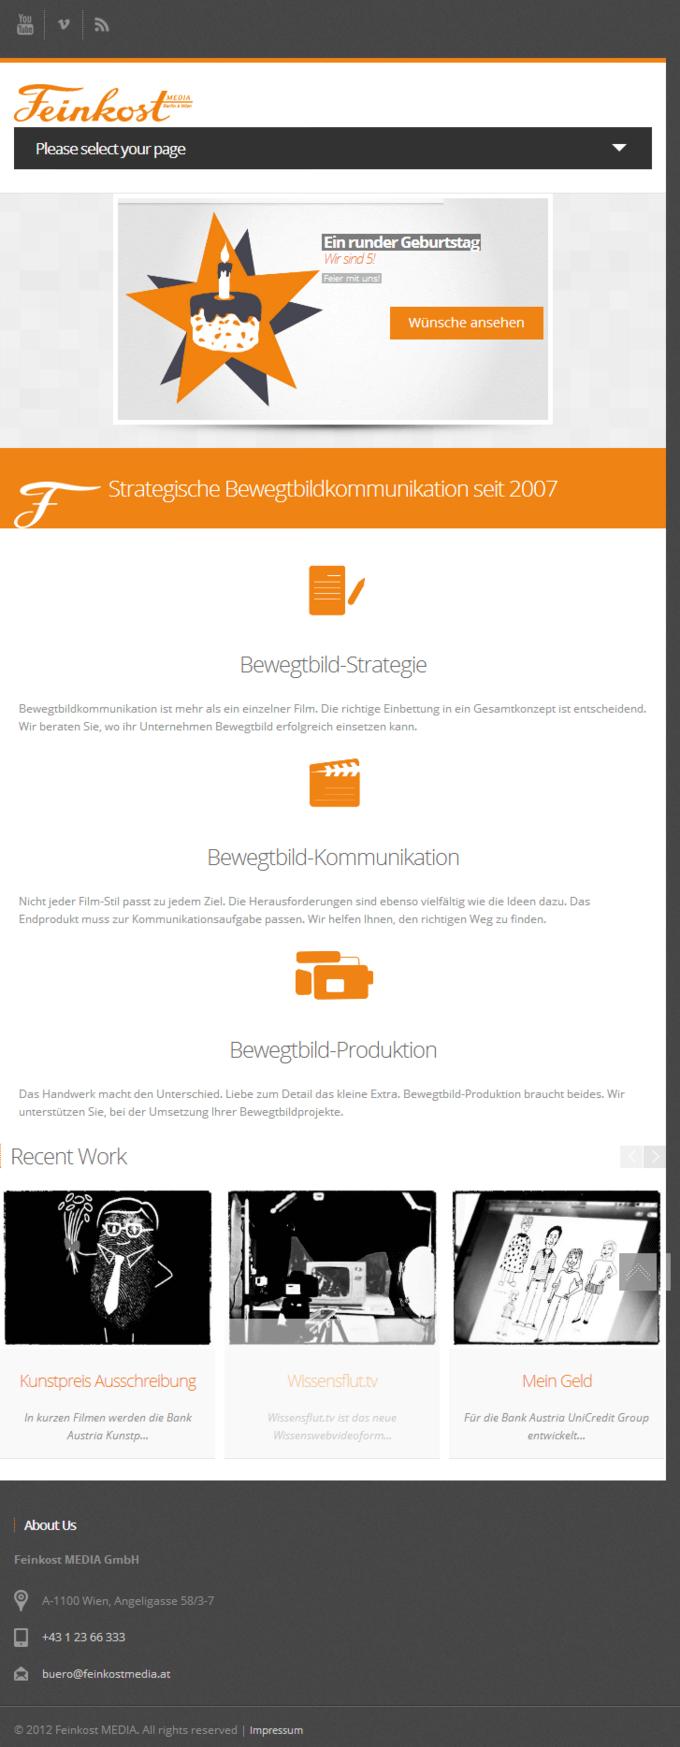 FeinkostMEDIA Website Screenshot - Mobile Site